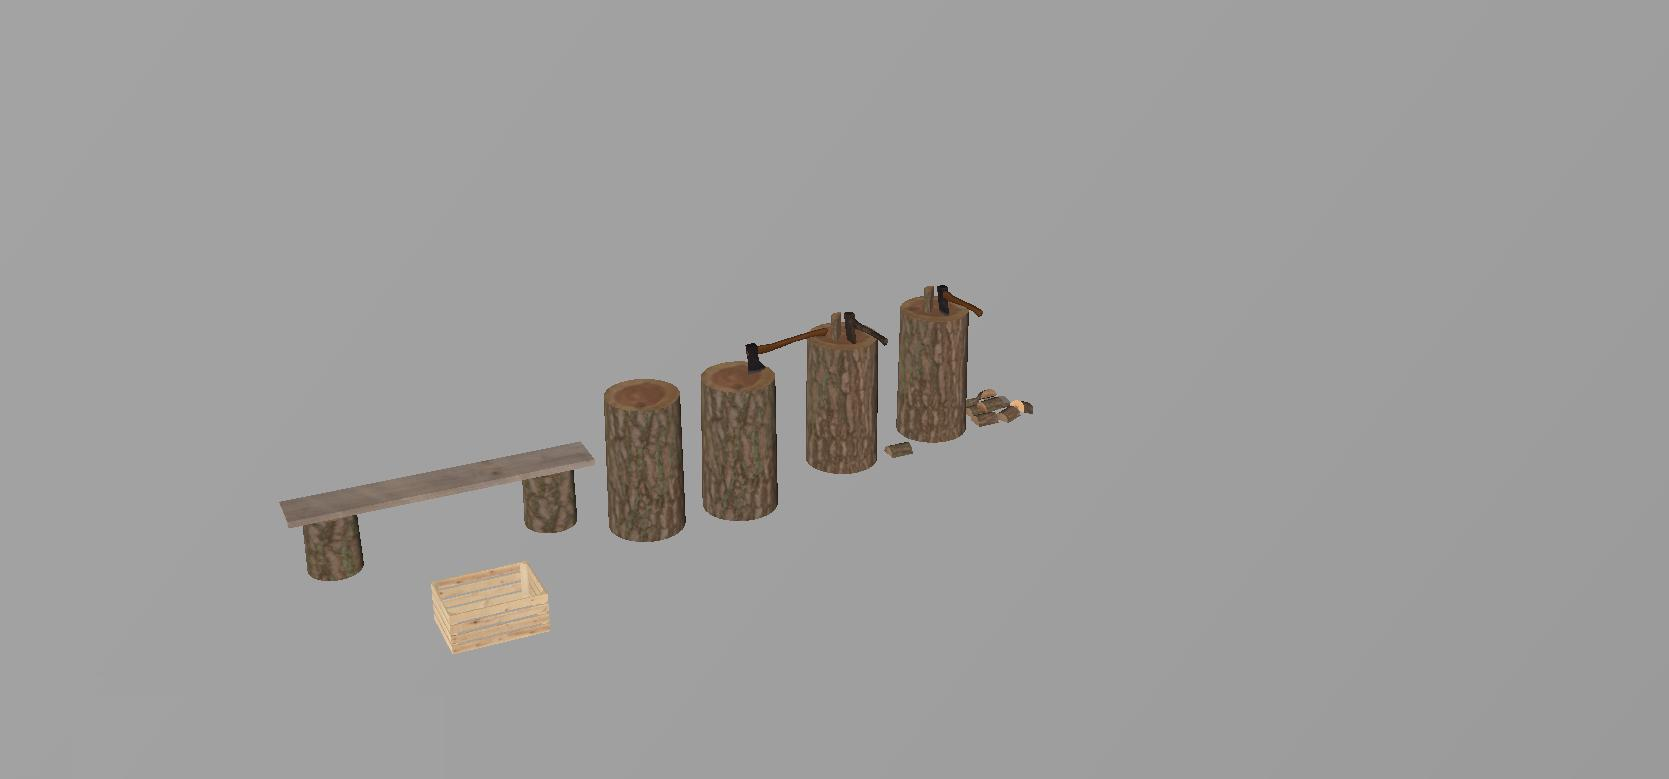 Fire Department Wooden Ladders When Men Were Men And